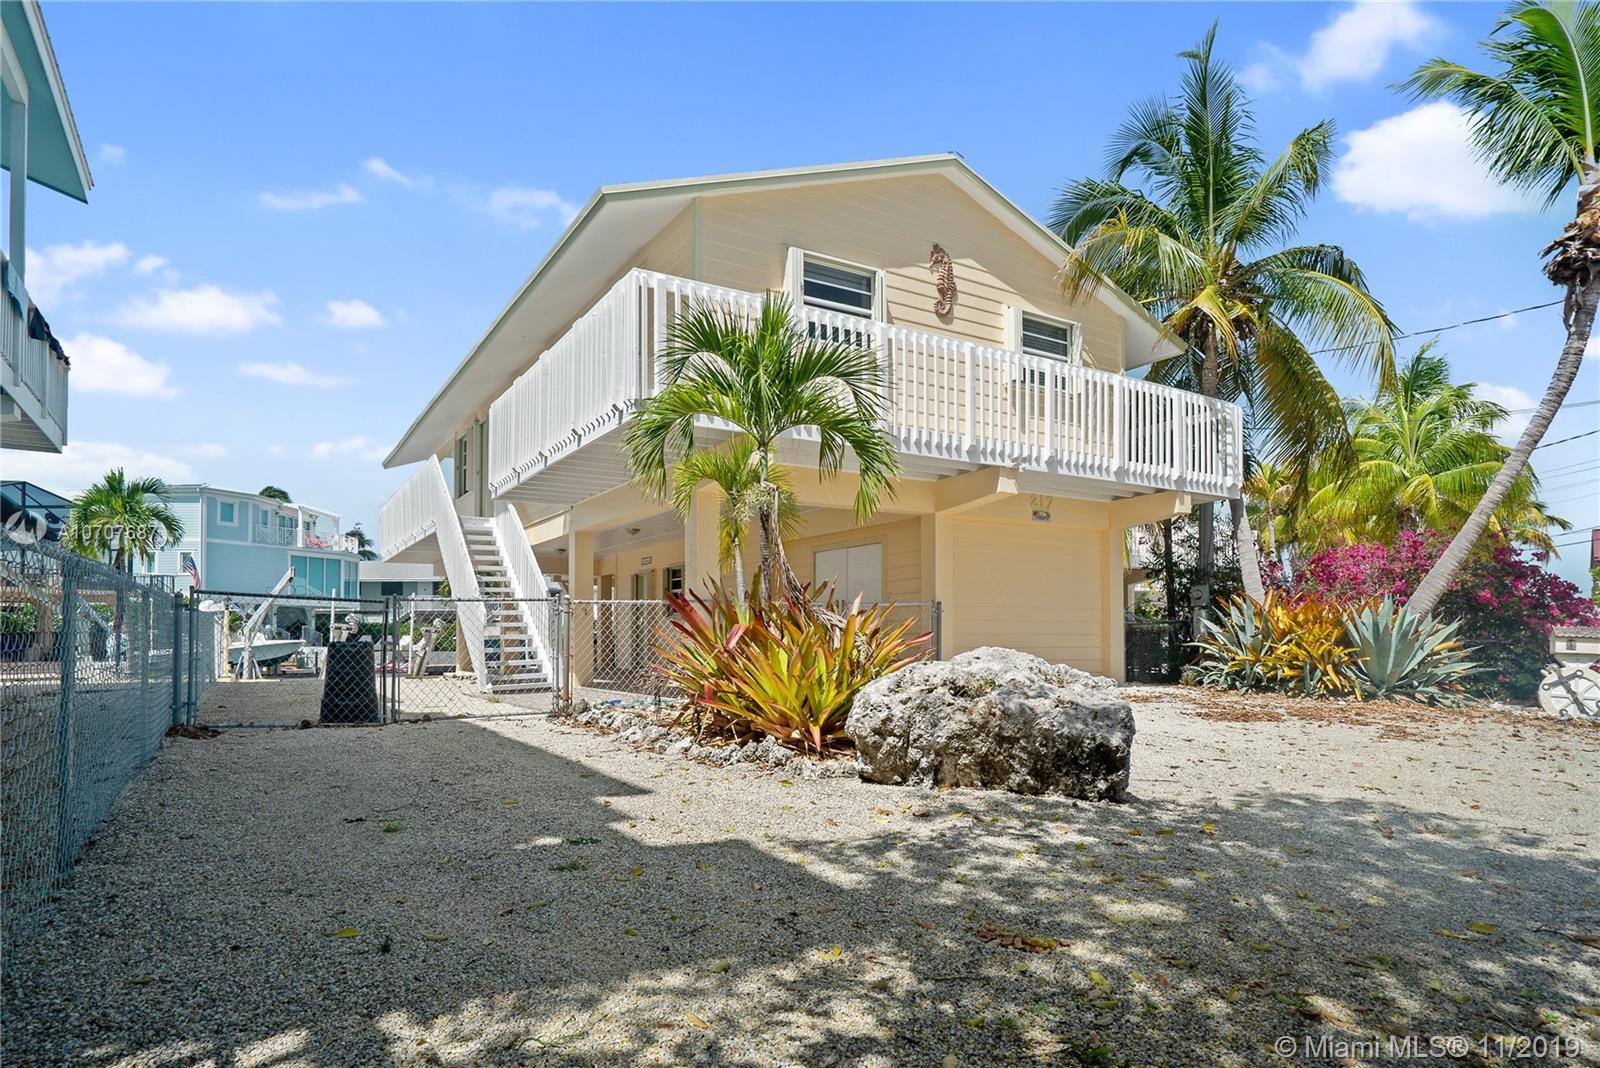 217 Bristol Ct, Other City - Keys/Islands/Caribbean FL 33070